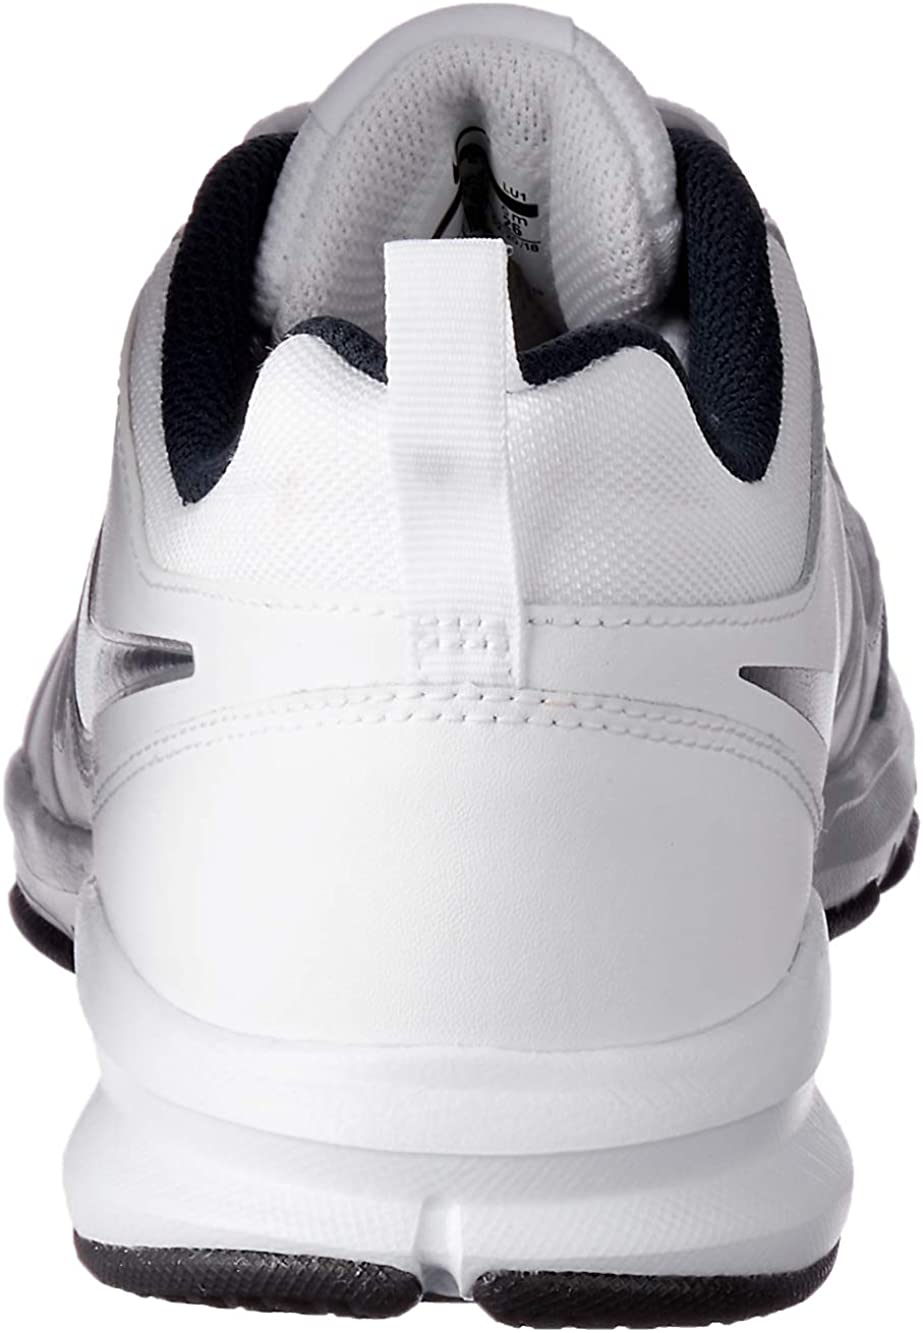 Amazon.com | Nike T-Lite Xi Mens Running Trainers 616544 Sneakers ...